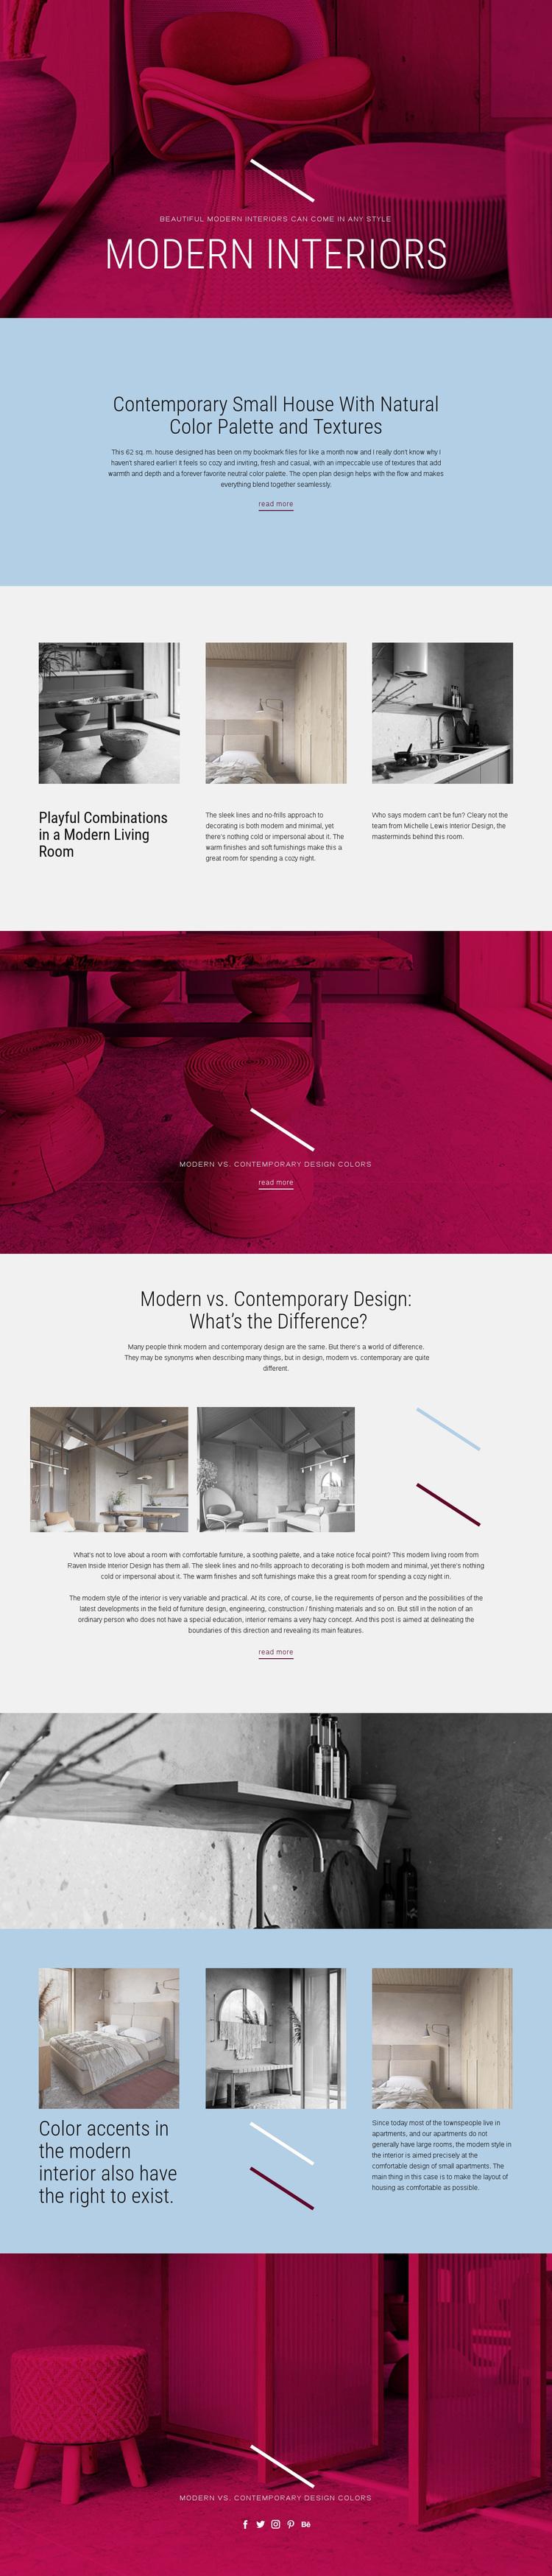 Art Nouveau furniture Joomla Page Builder